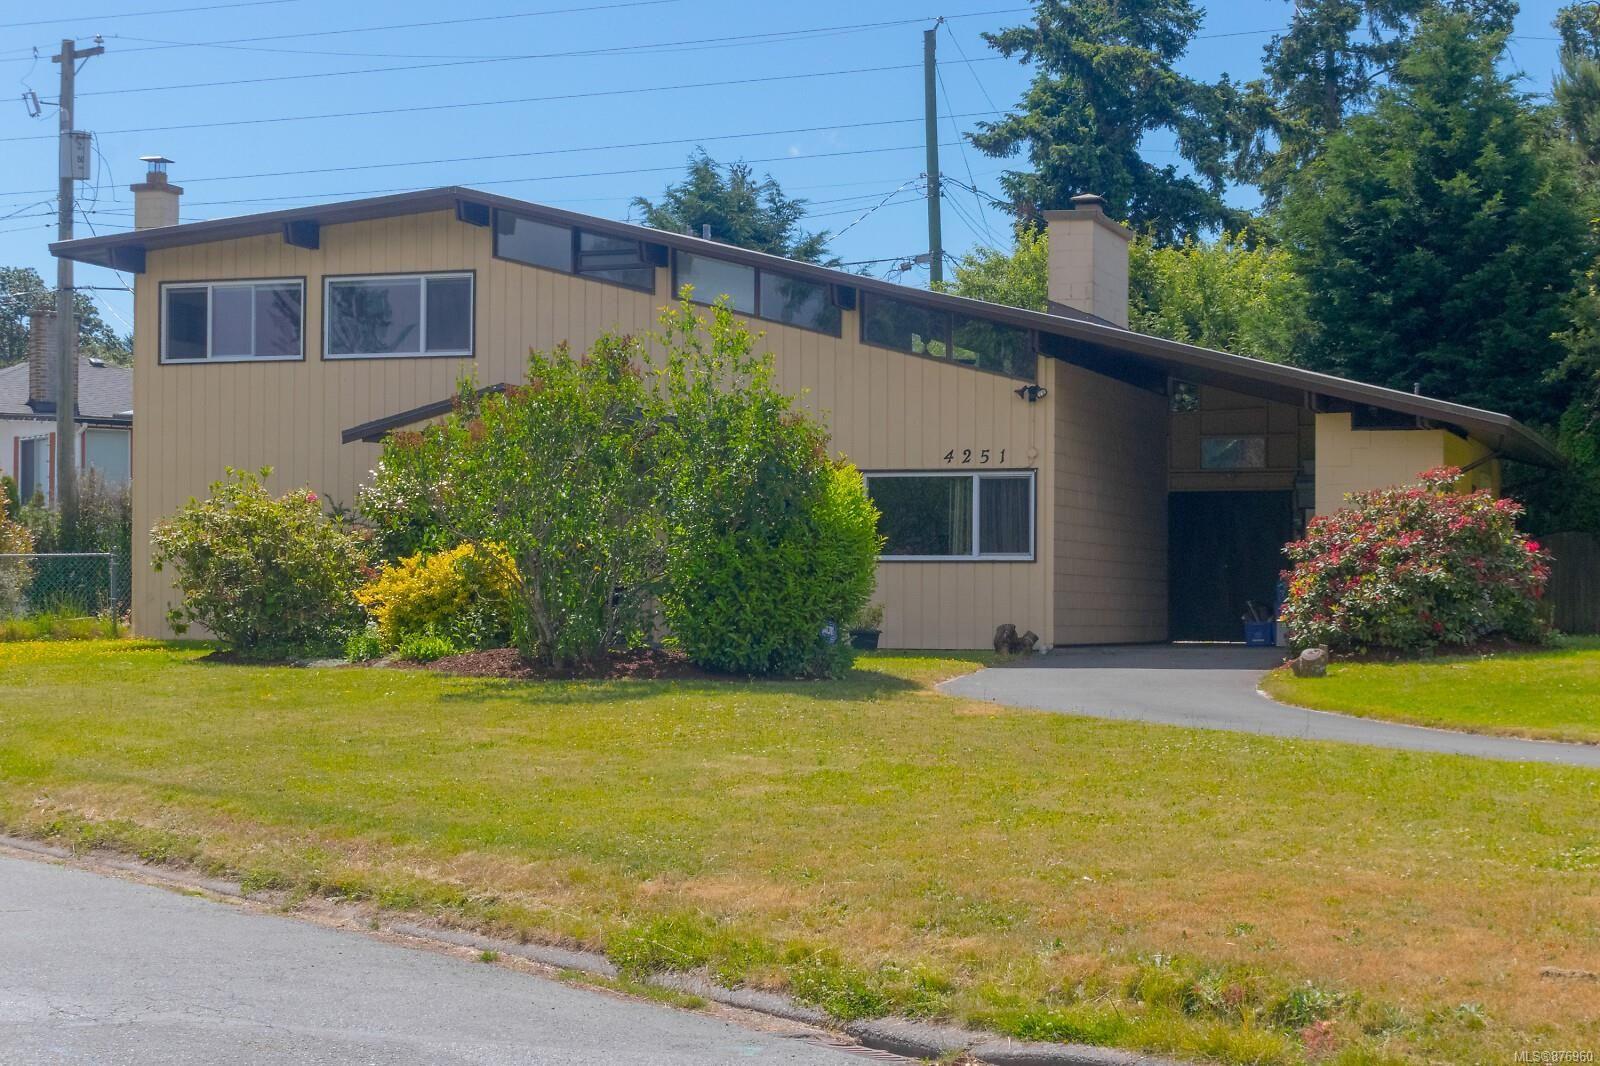 Main Photo: 4251 Springridge Cres in : SW Northridge House for sale (Saanich West)  : MLS®# 876960